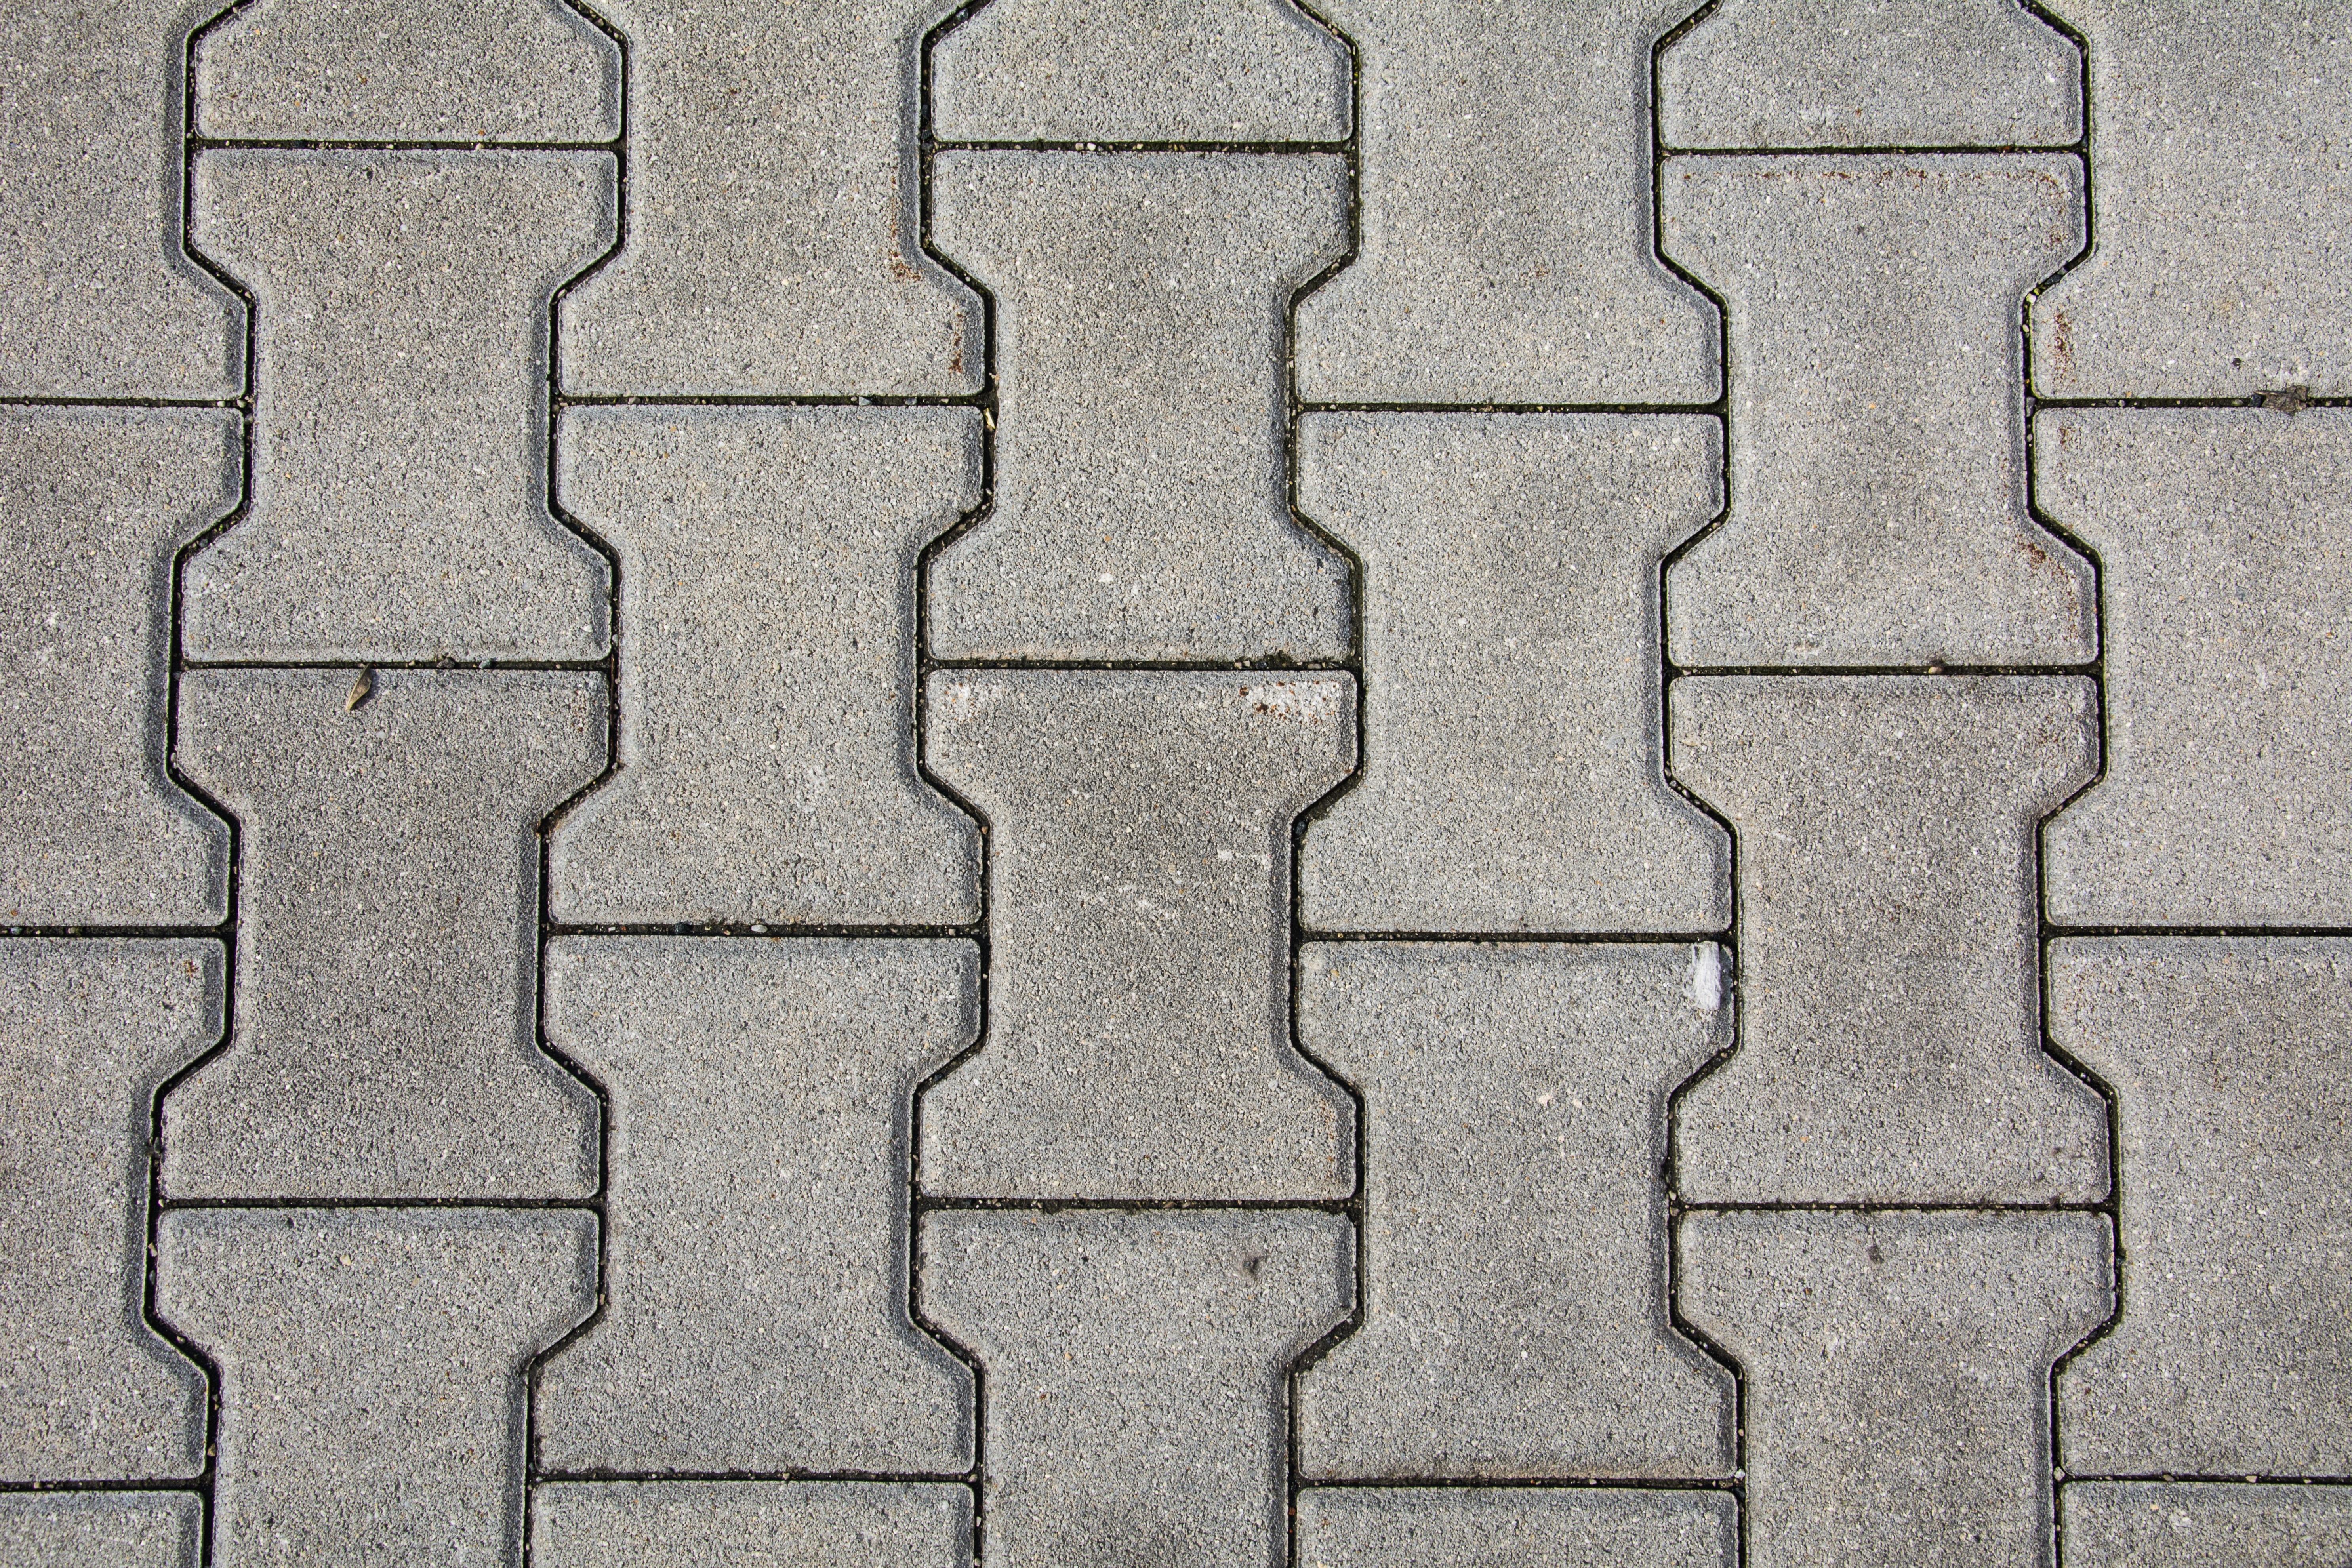 fotos gratis estructura la carretera suelo textura piso guijarro pared asfalto patrn lnea azulejo pared de piedra ladrillo material